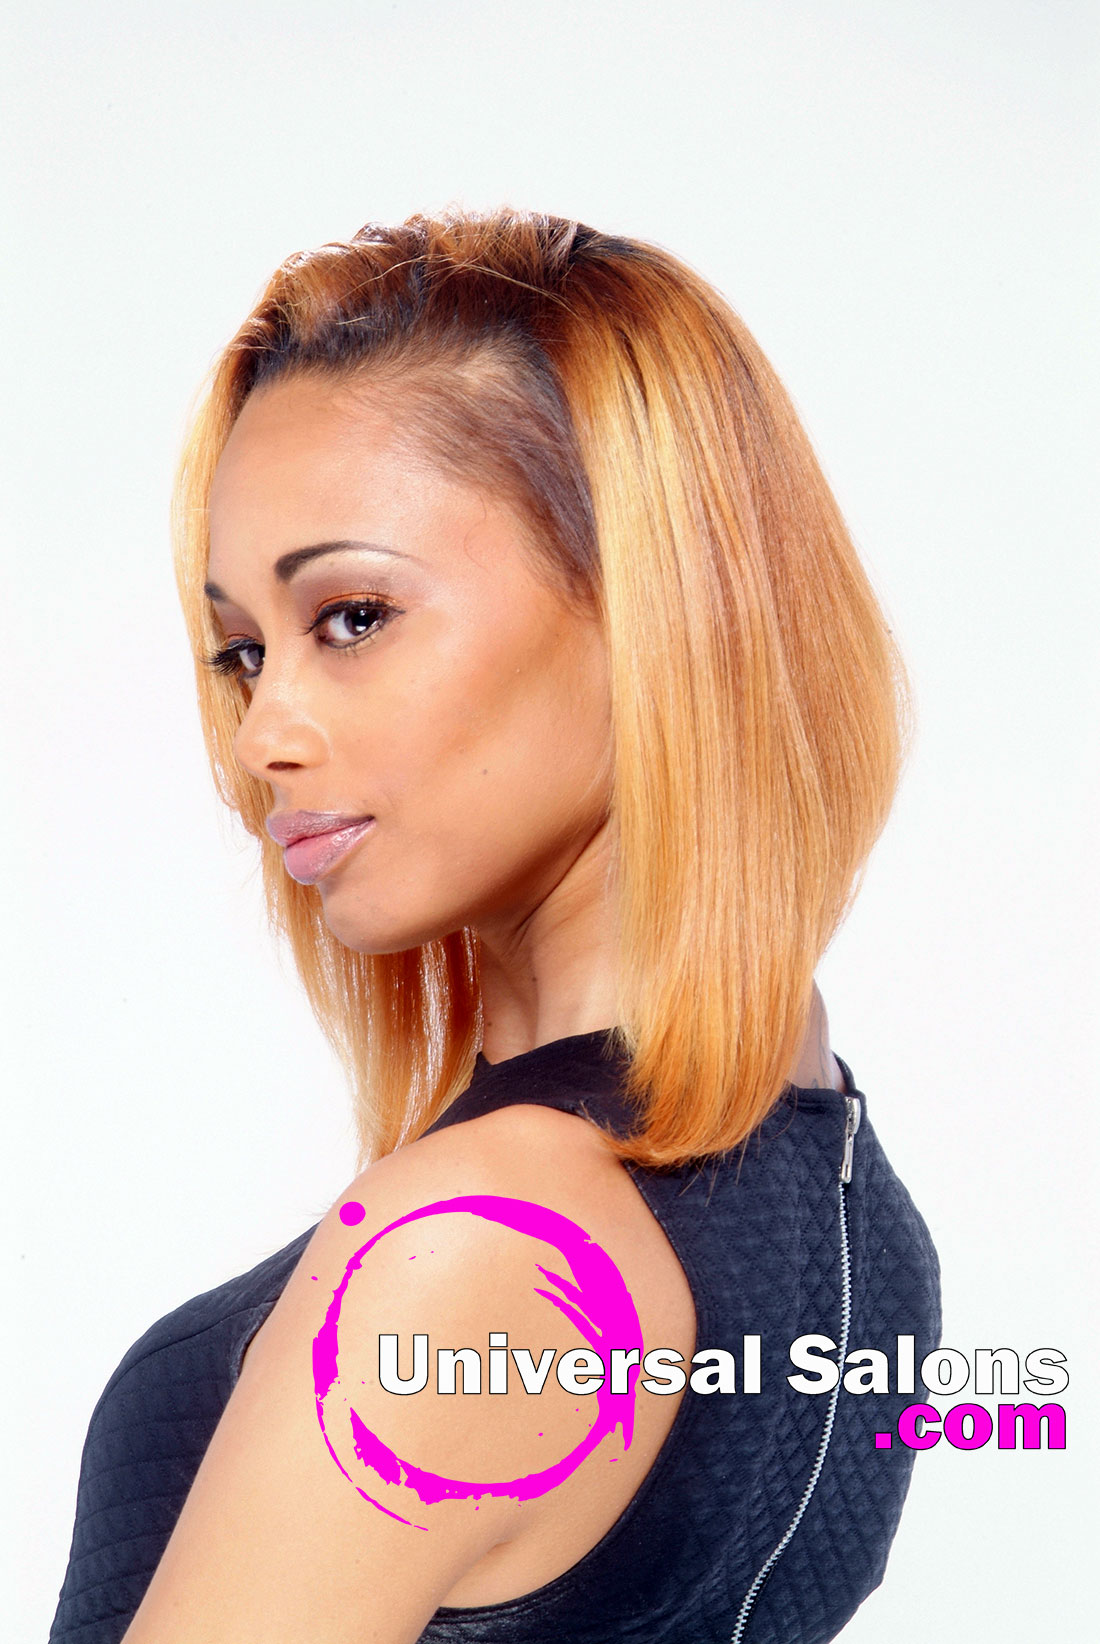 Universal Salon Hair Styles | blackhairstylecuts.com